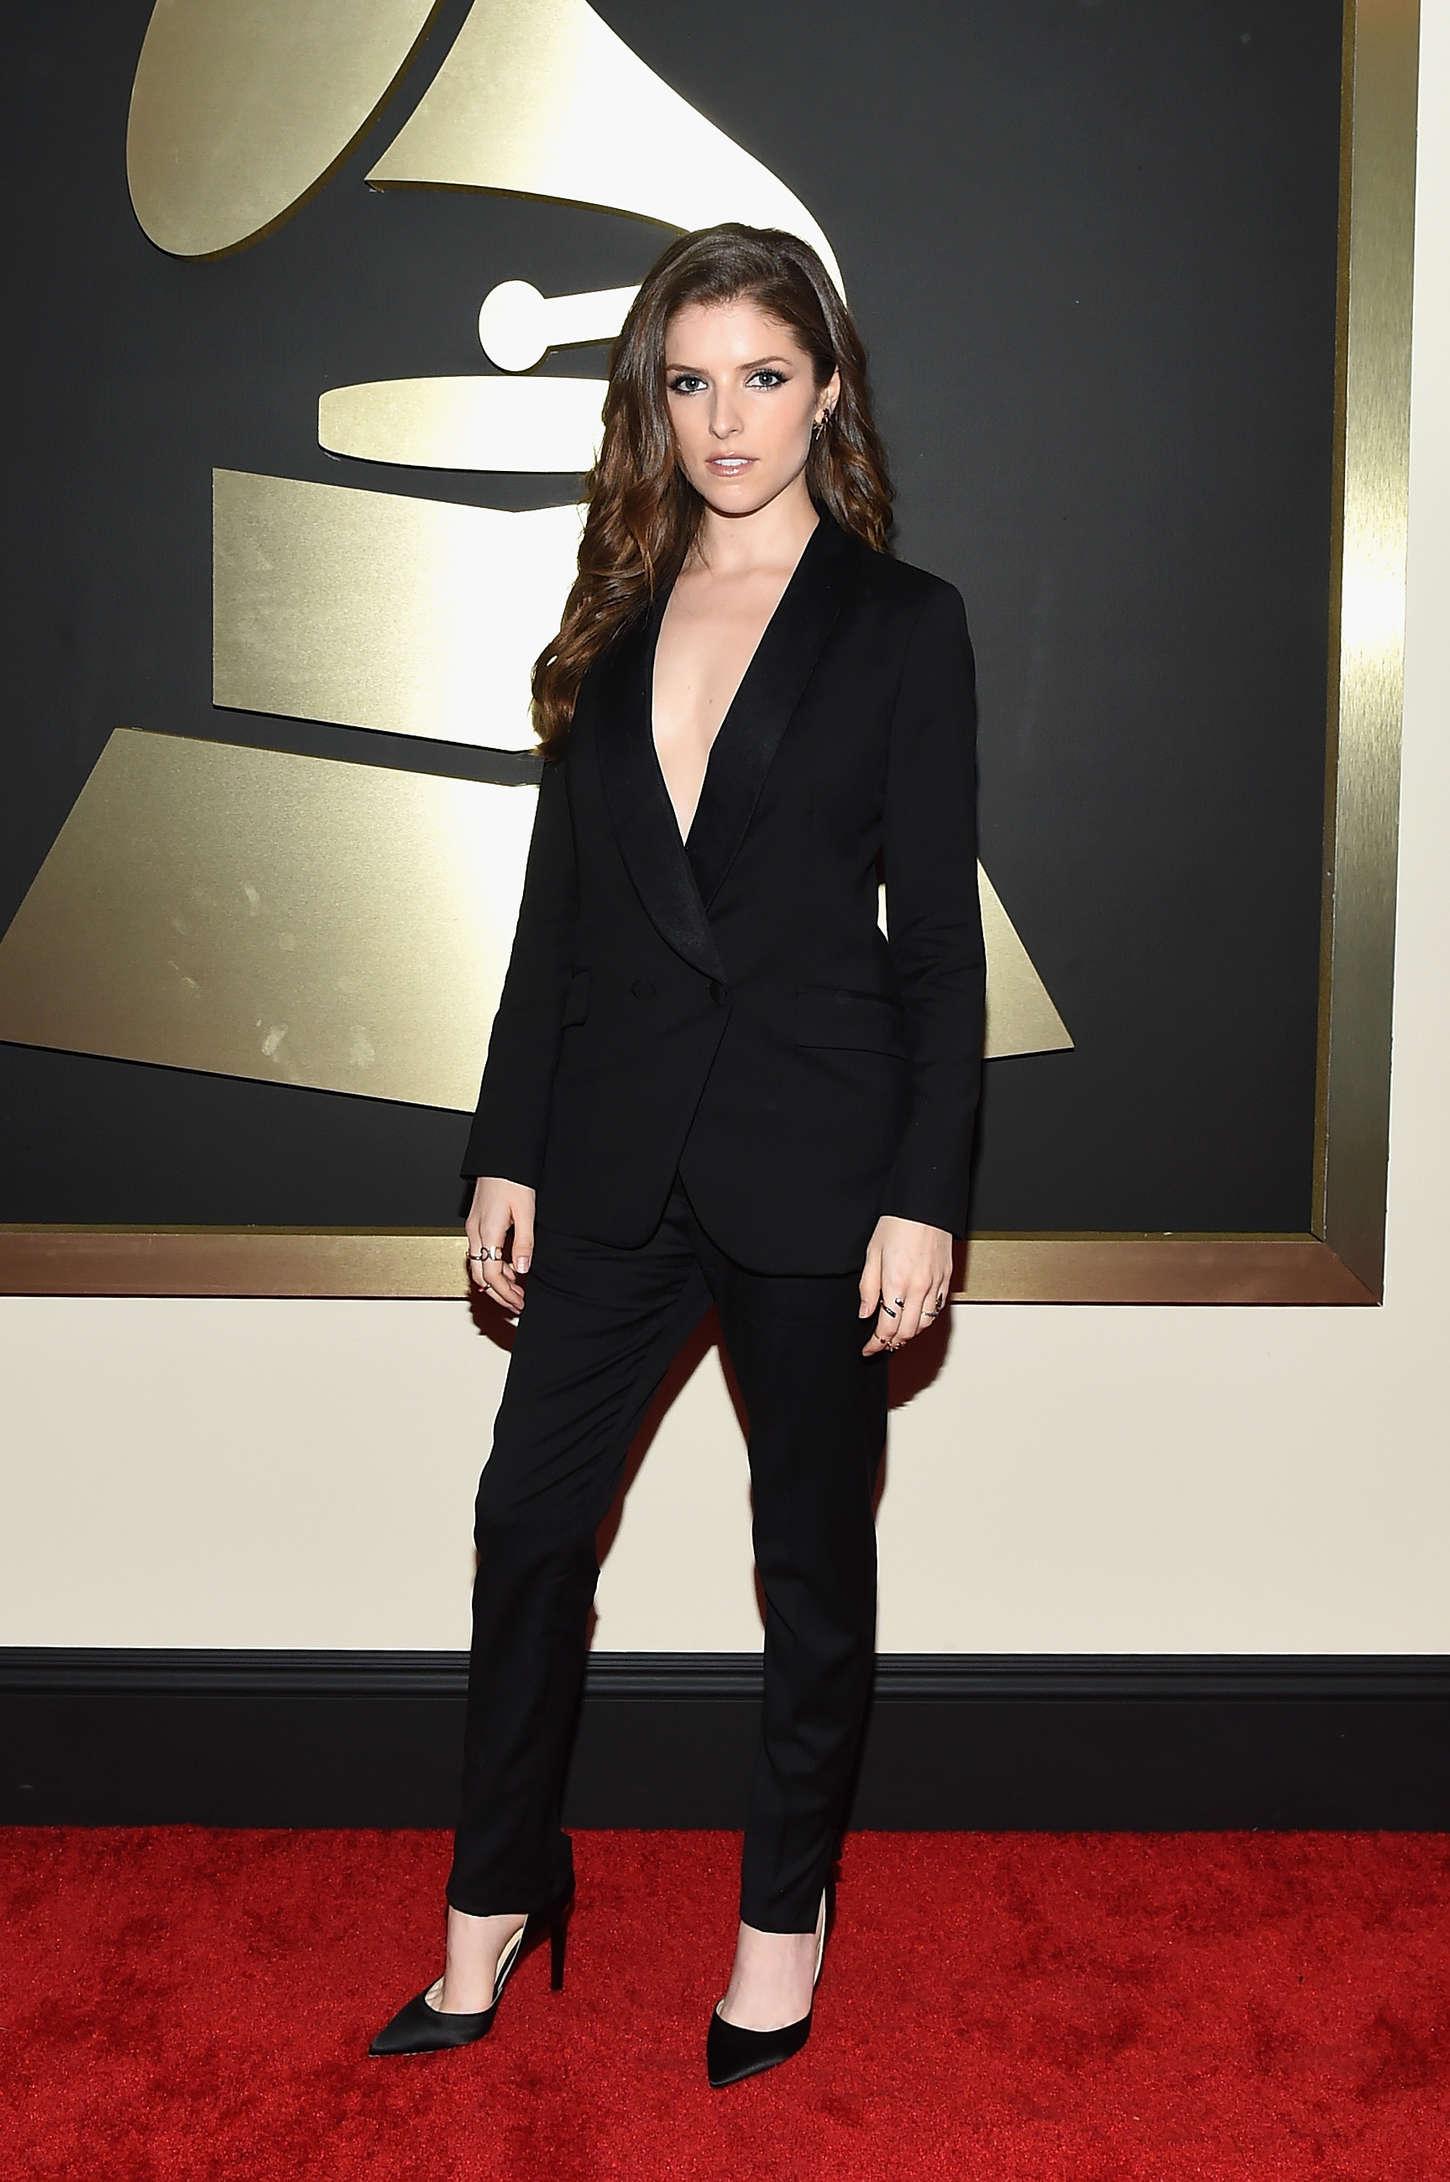 Anna Kendrick 2015 : Anna Kendrick: 2015 GRAMMY Awards -03